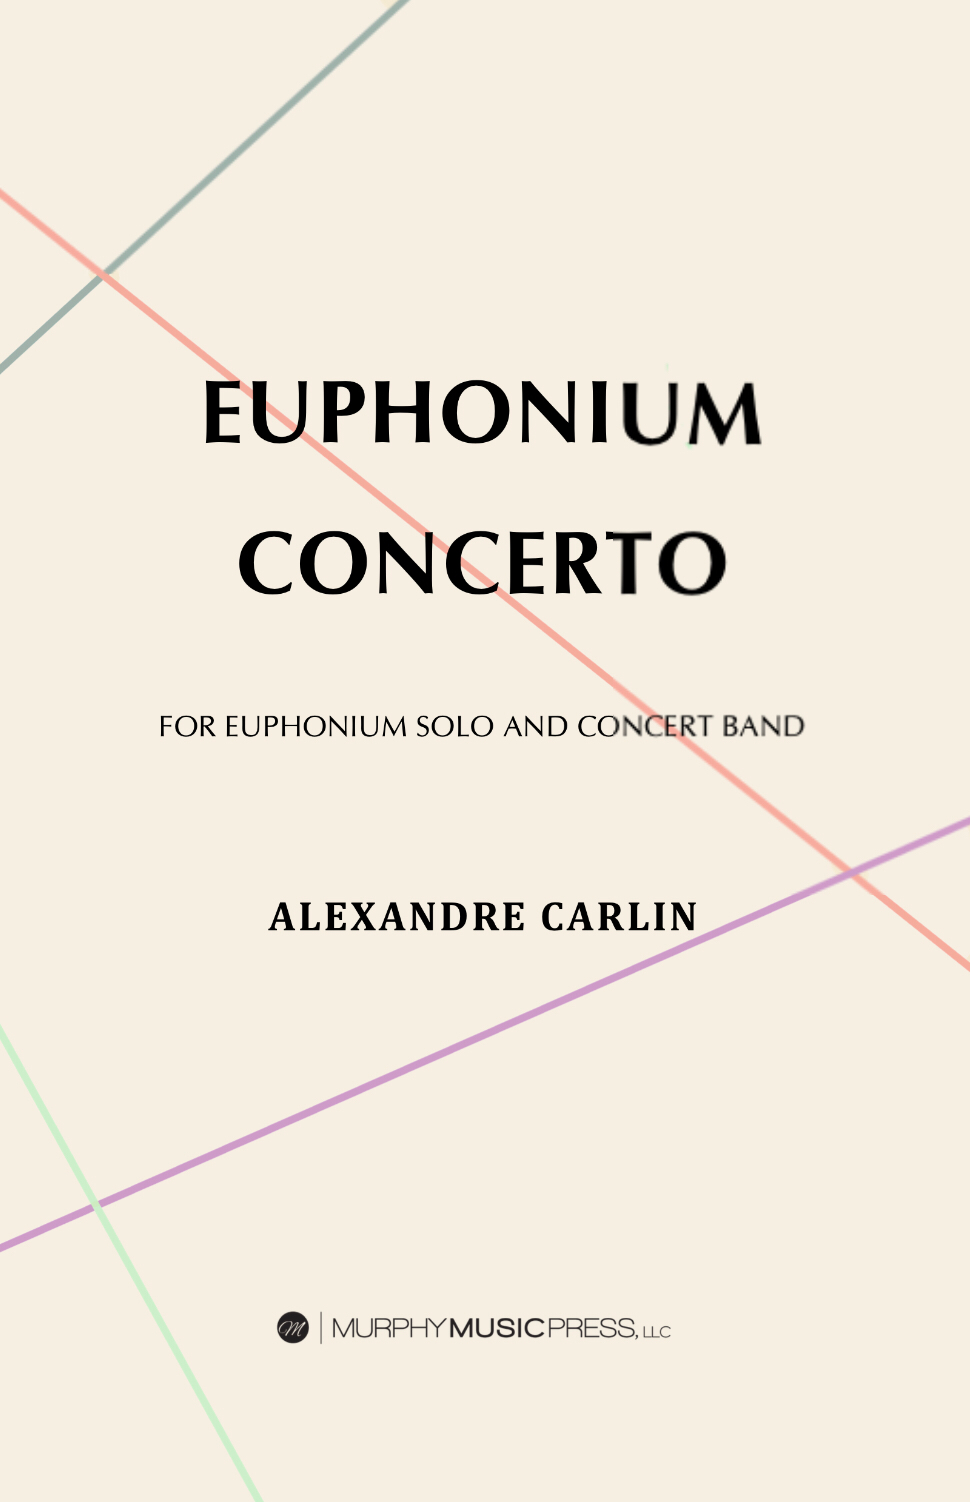 Concerto For Euphonium by Alexandre Carlin